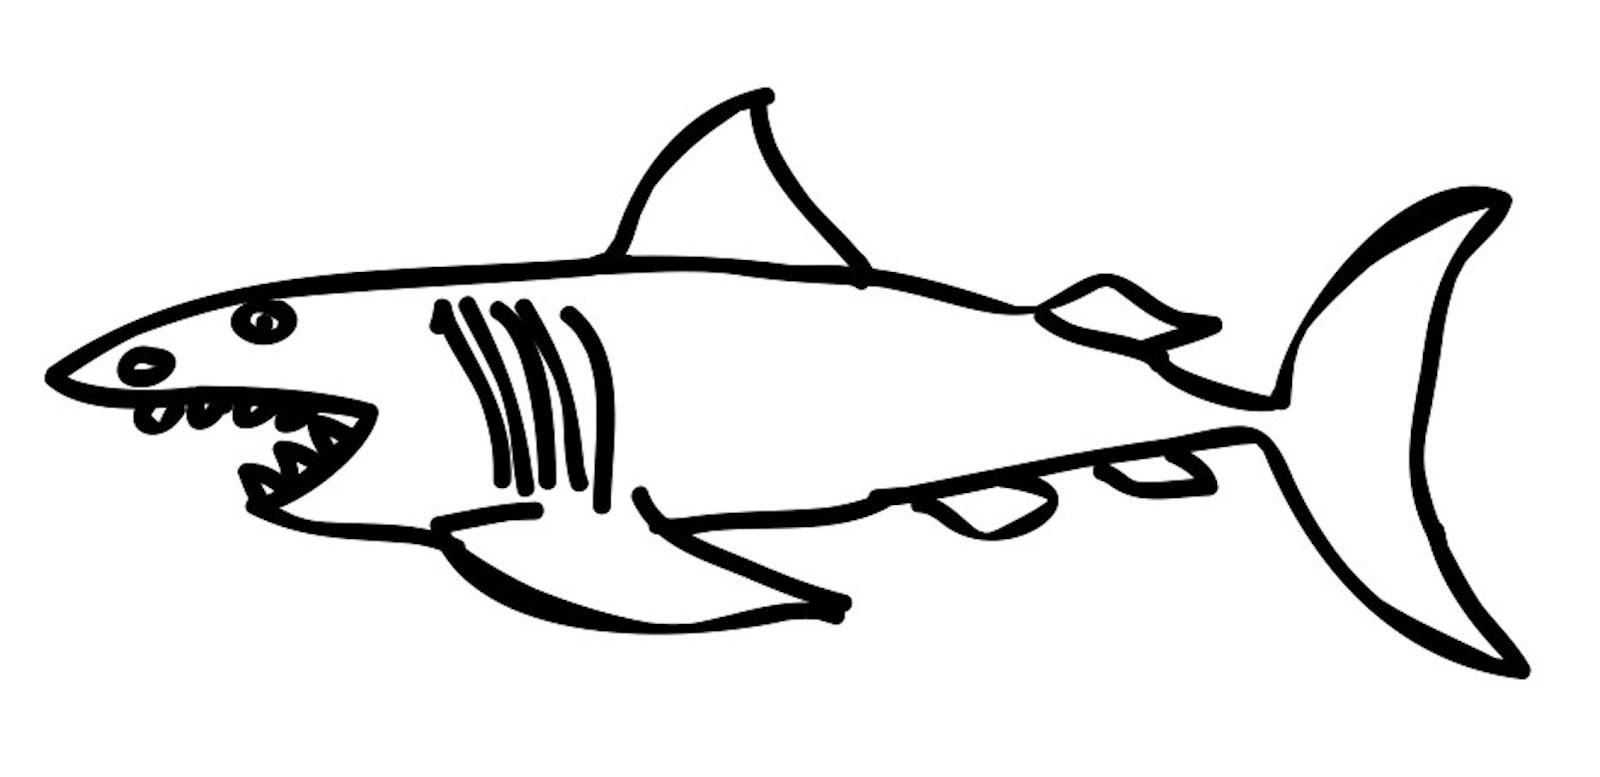 Shark Drawing Template At Getdrawings